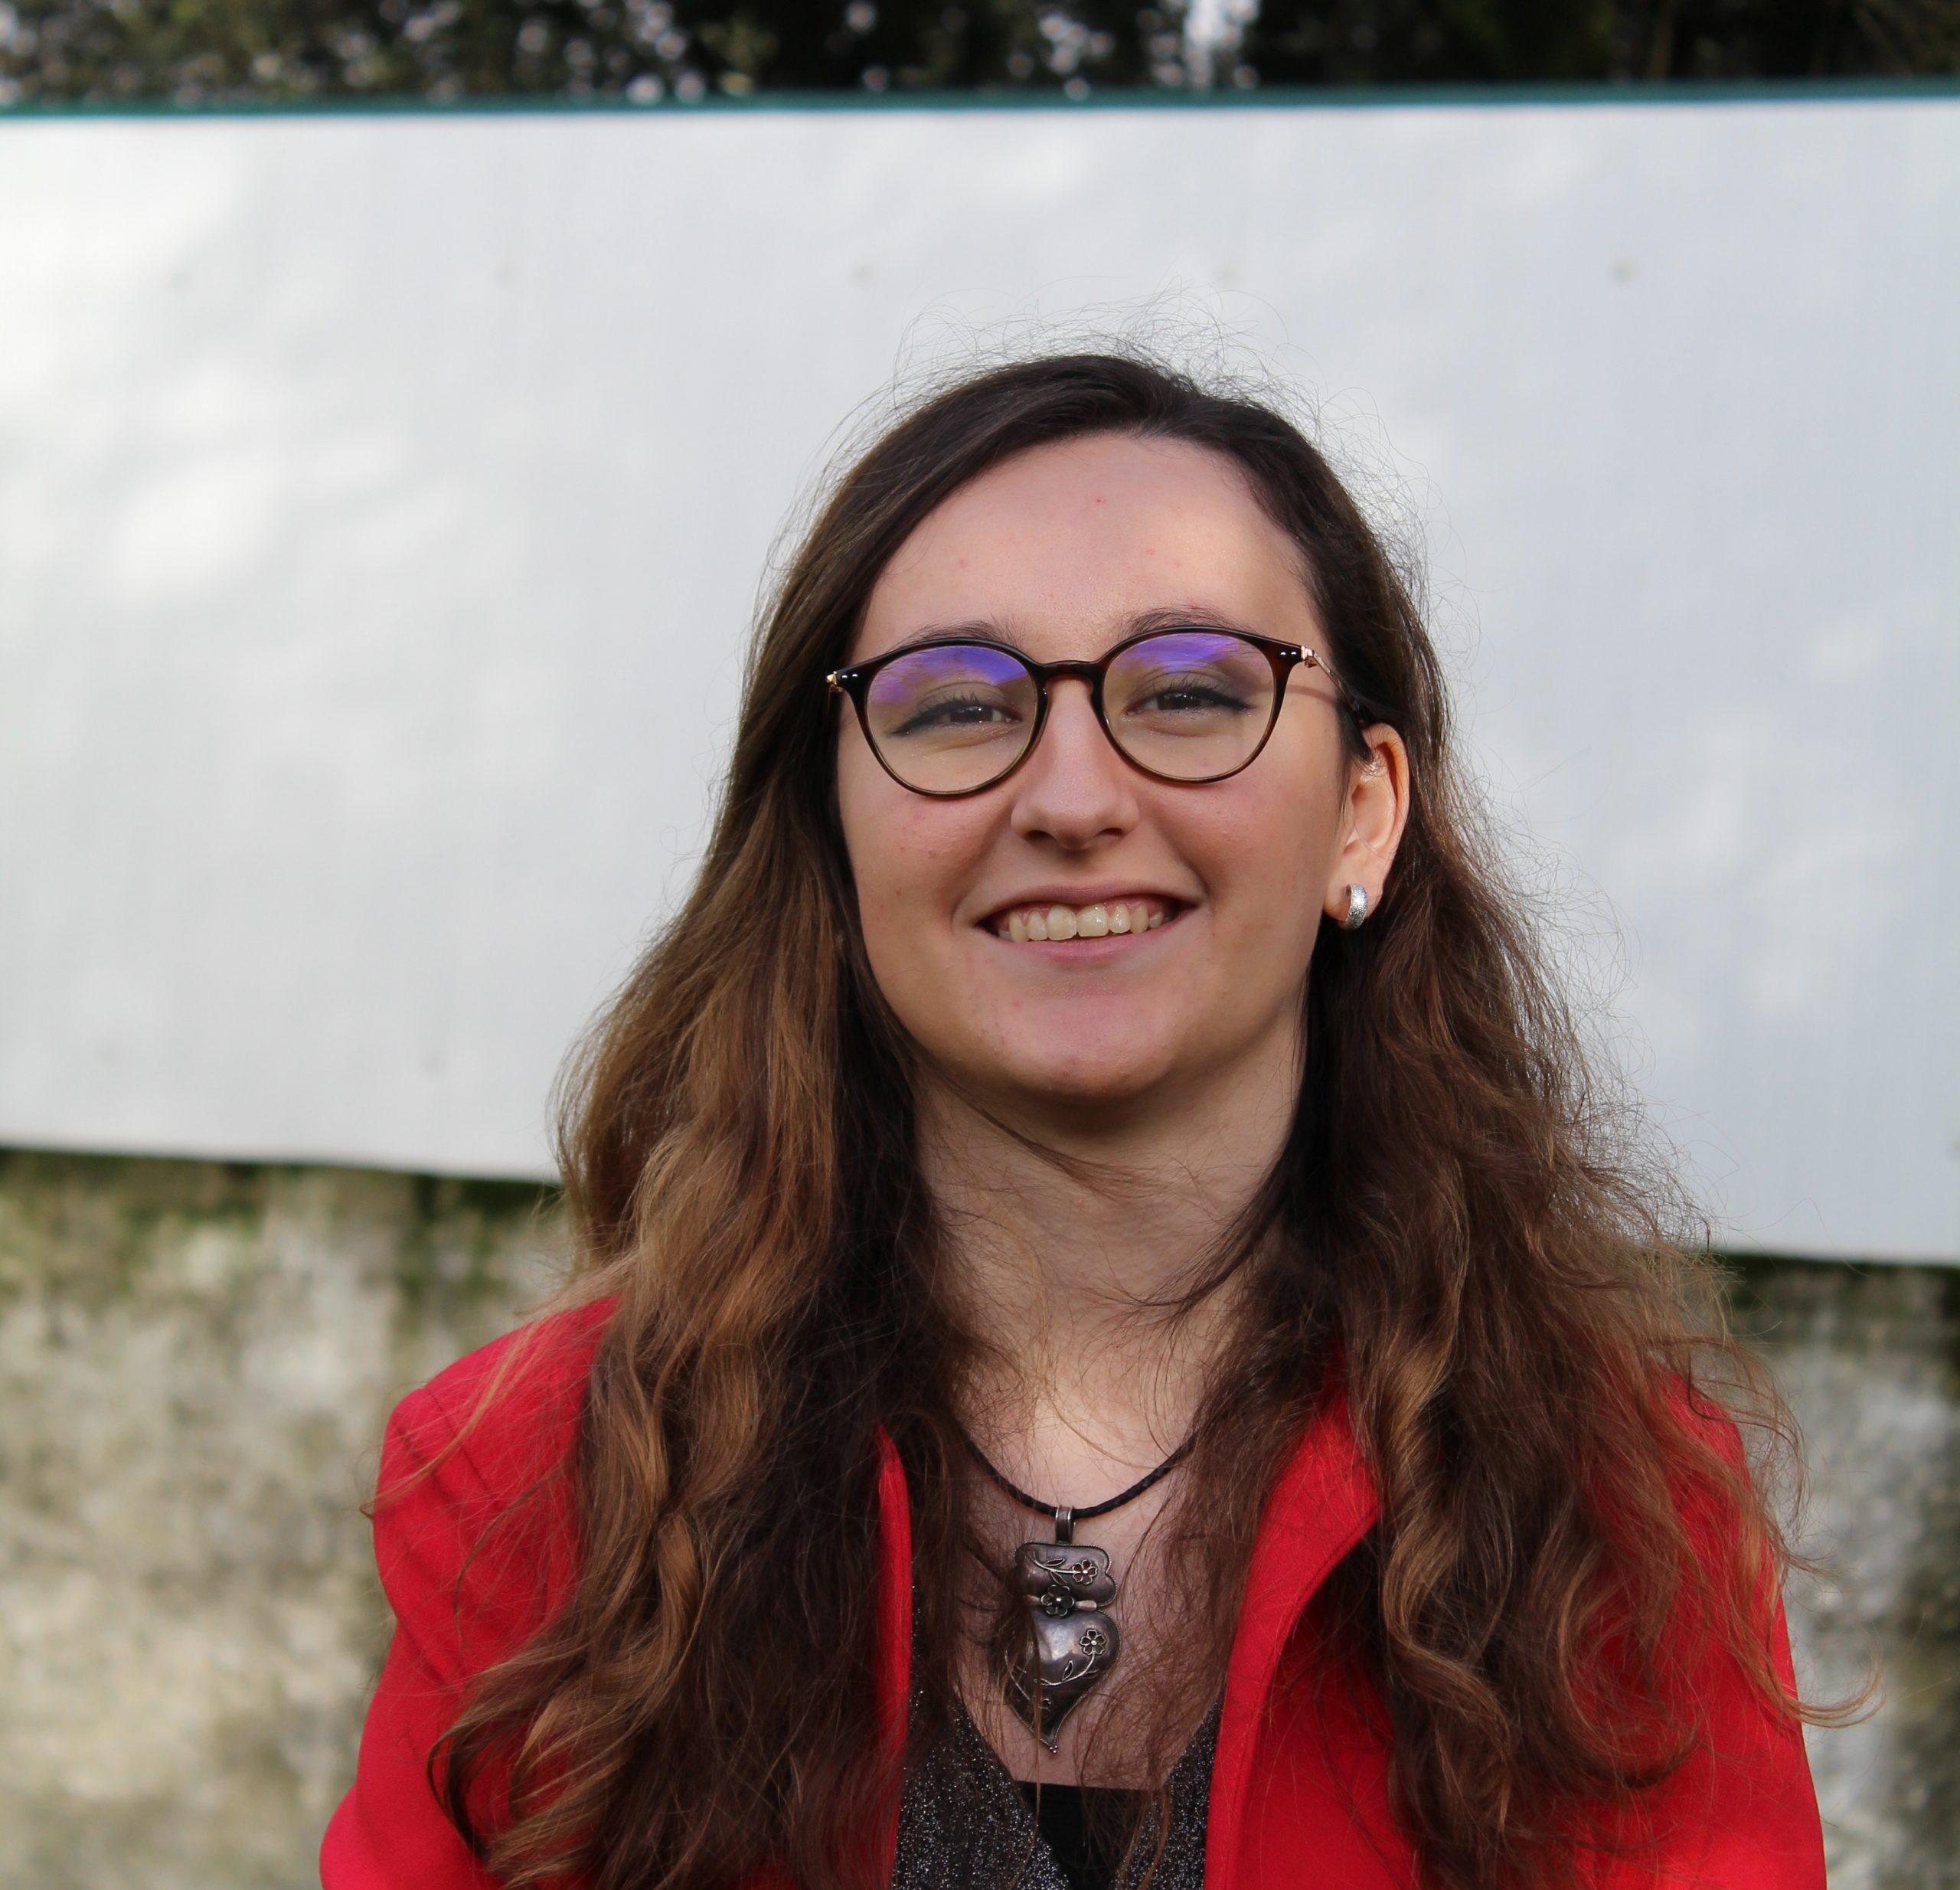 Olivia Teixeira Lima